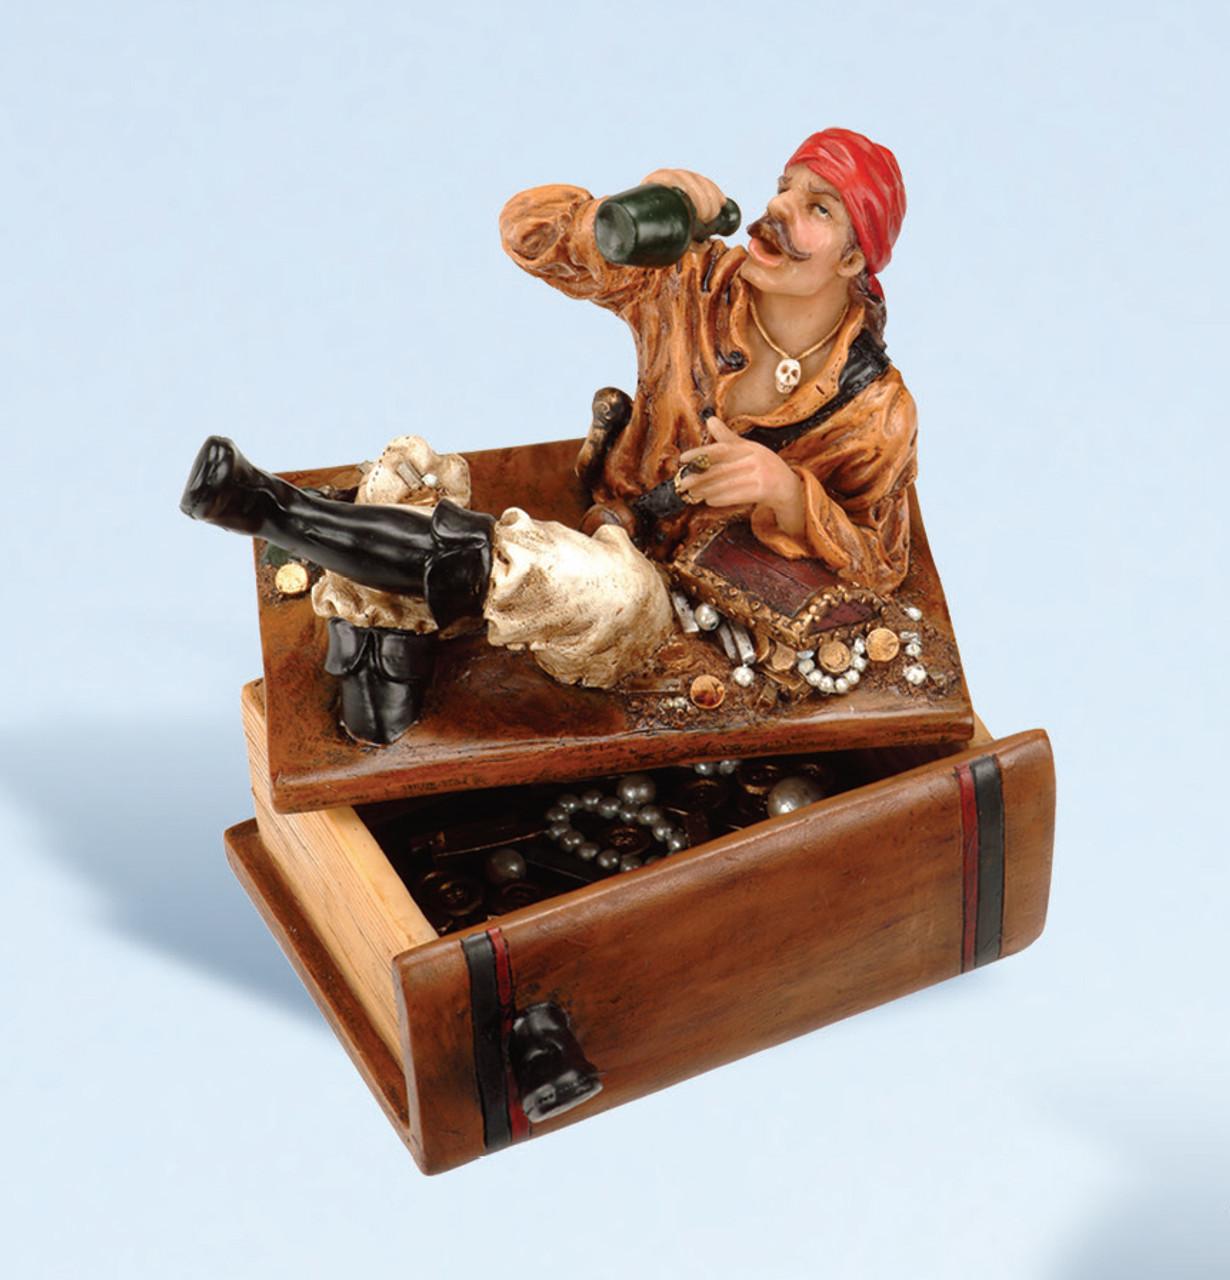 Card Deck Holder - Pirate